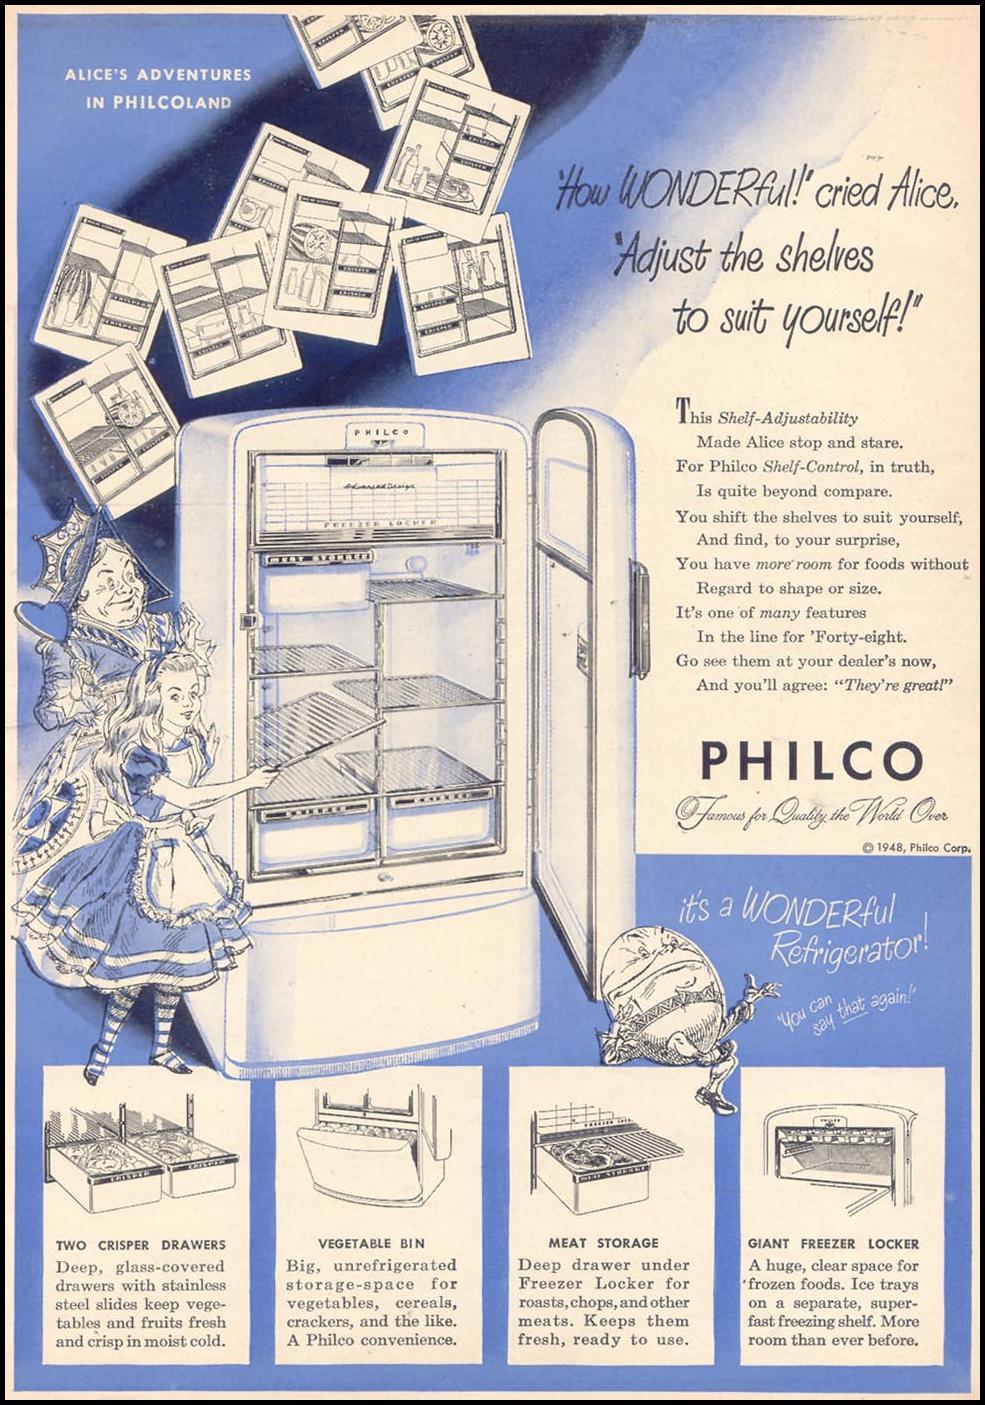 PHILCO REFRIGERATORS WOMAN'S DAY 09/01/1948 p. 5